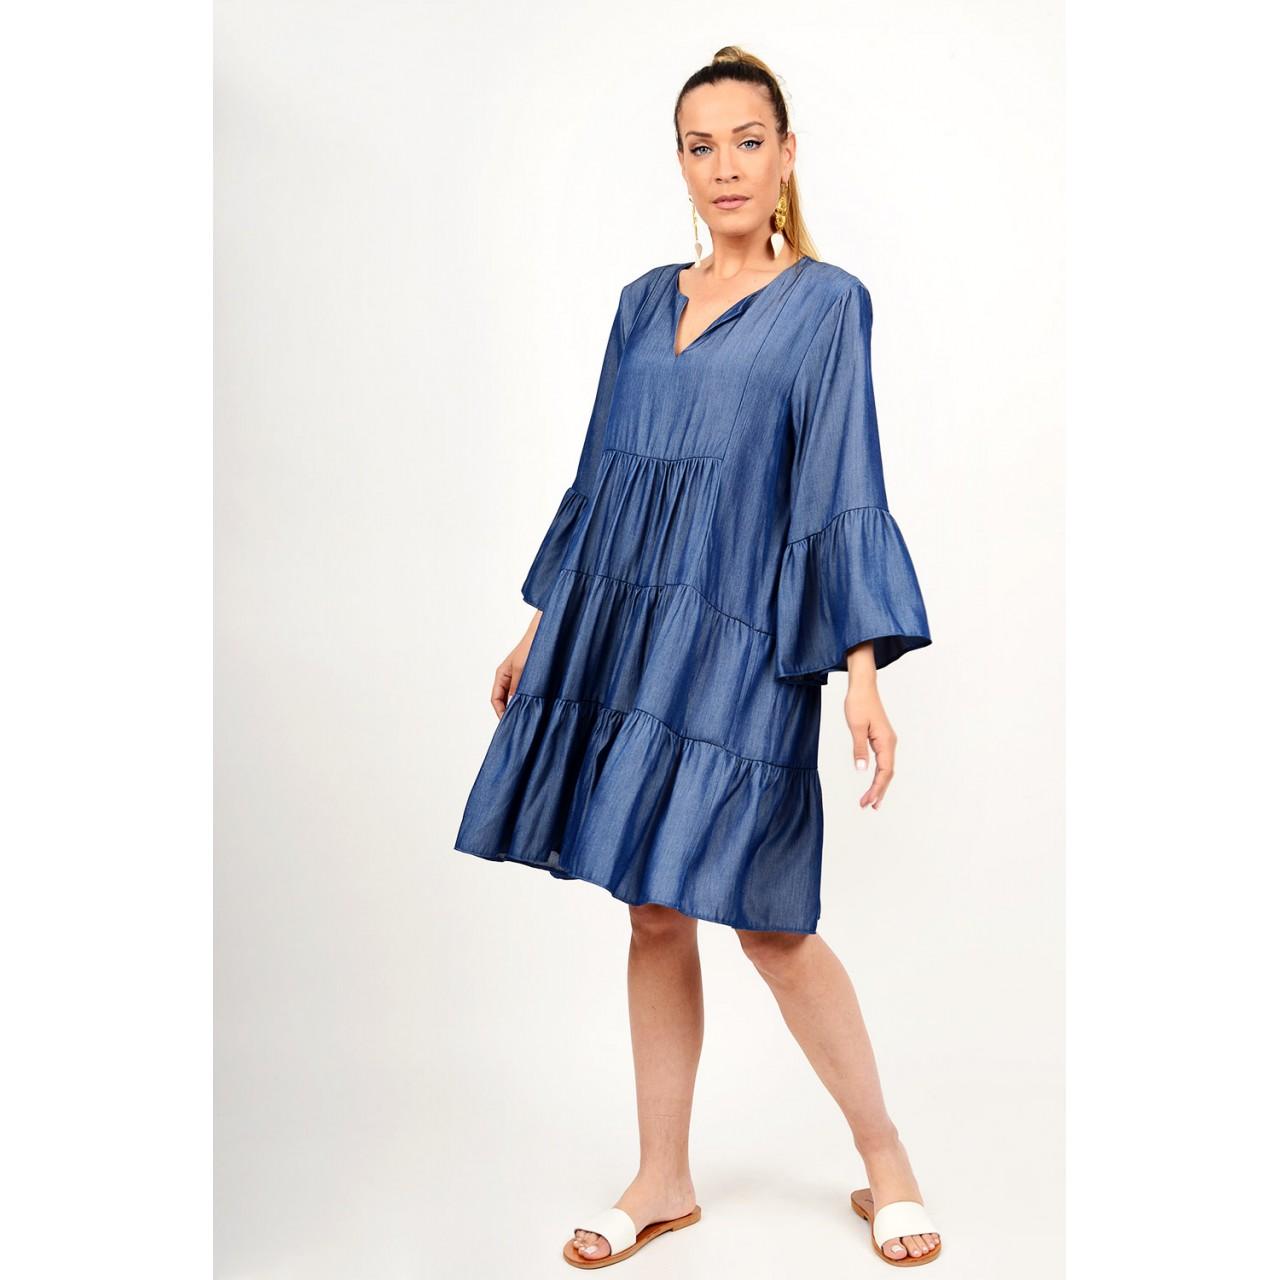 Midi jean boho dress